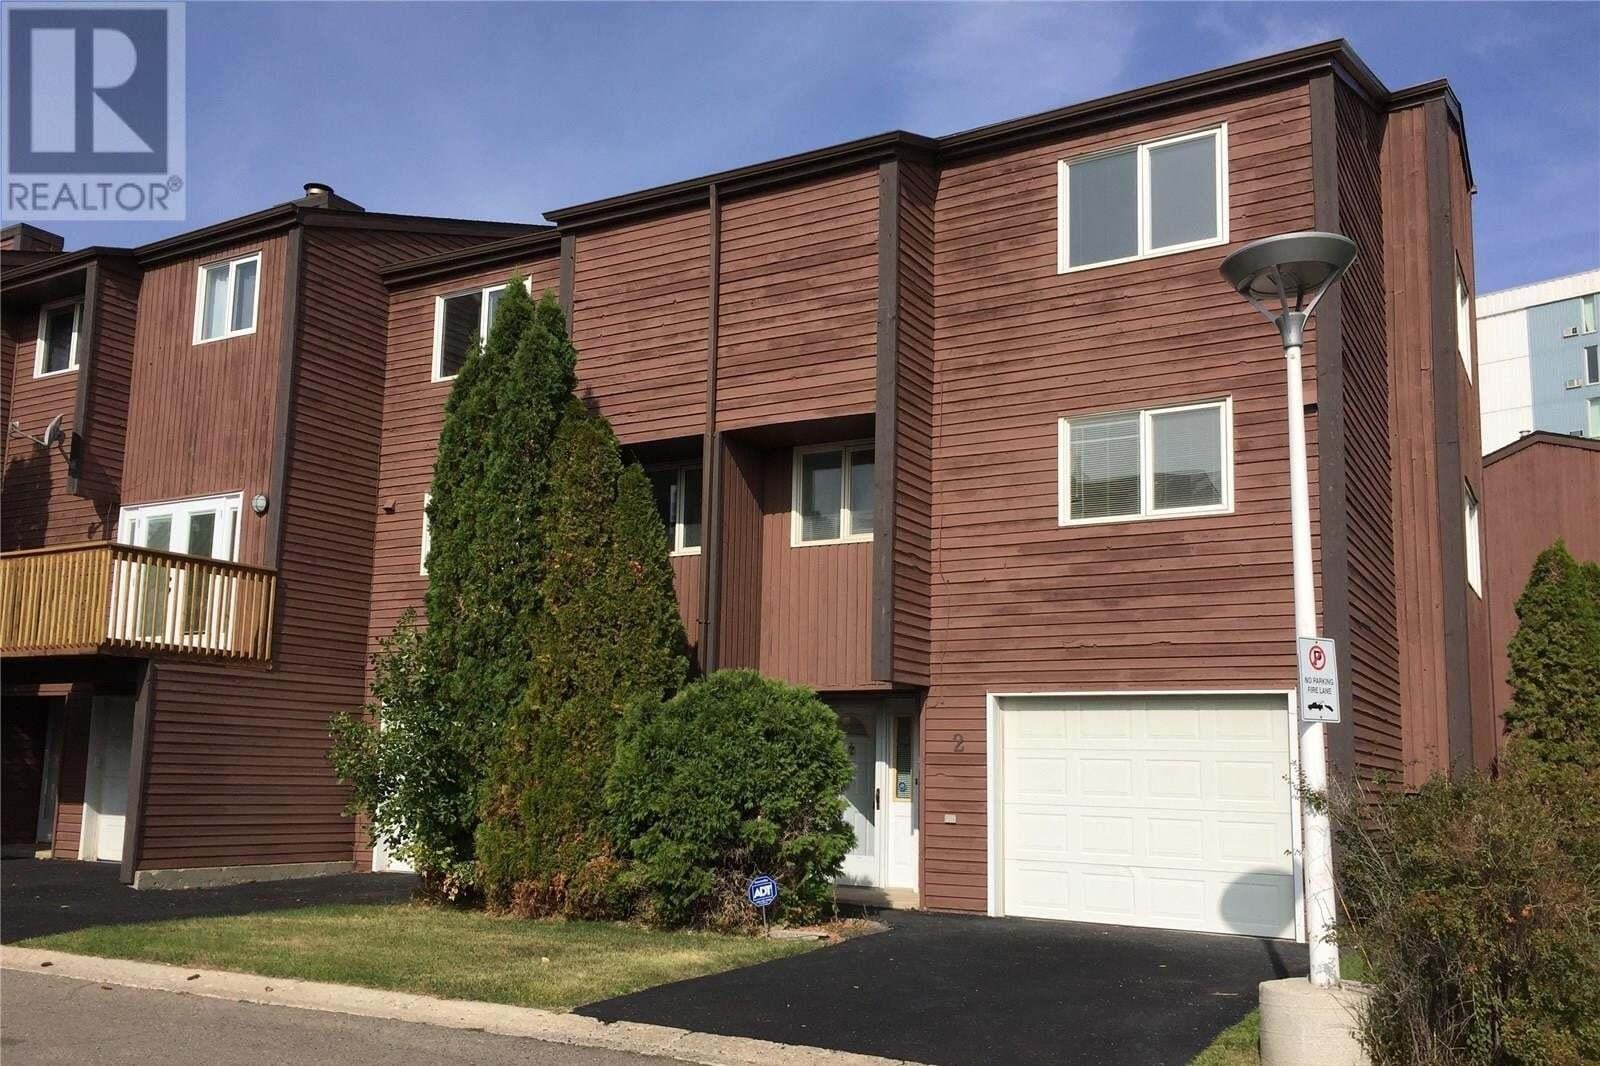 Townhouse for sale at 2 Asgar Wk Regina Saskatchewan - MLS: SK827449